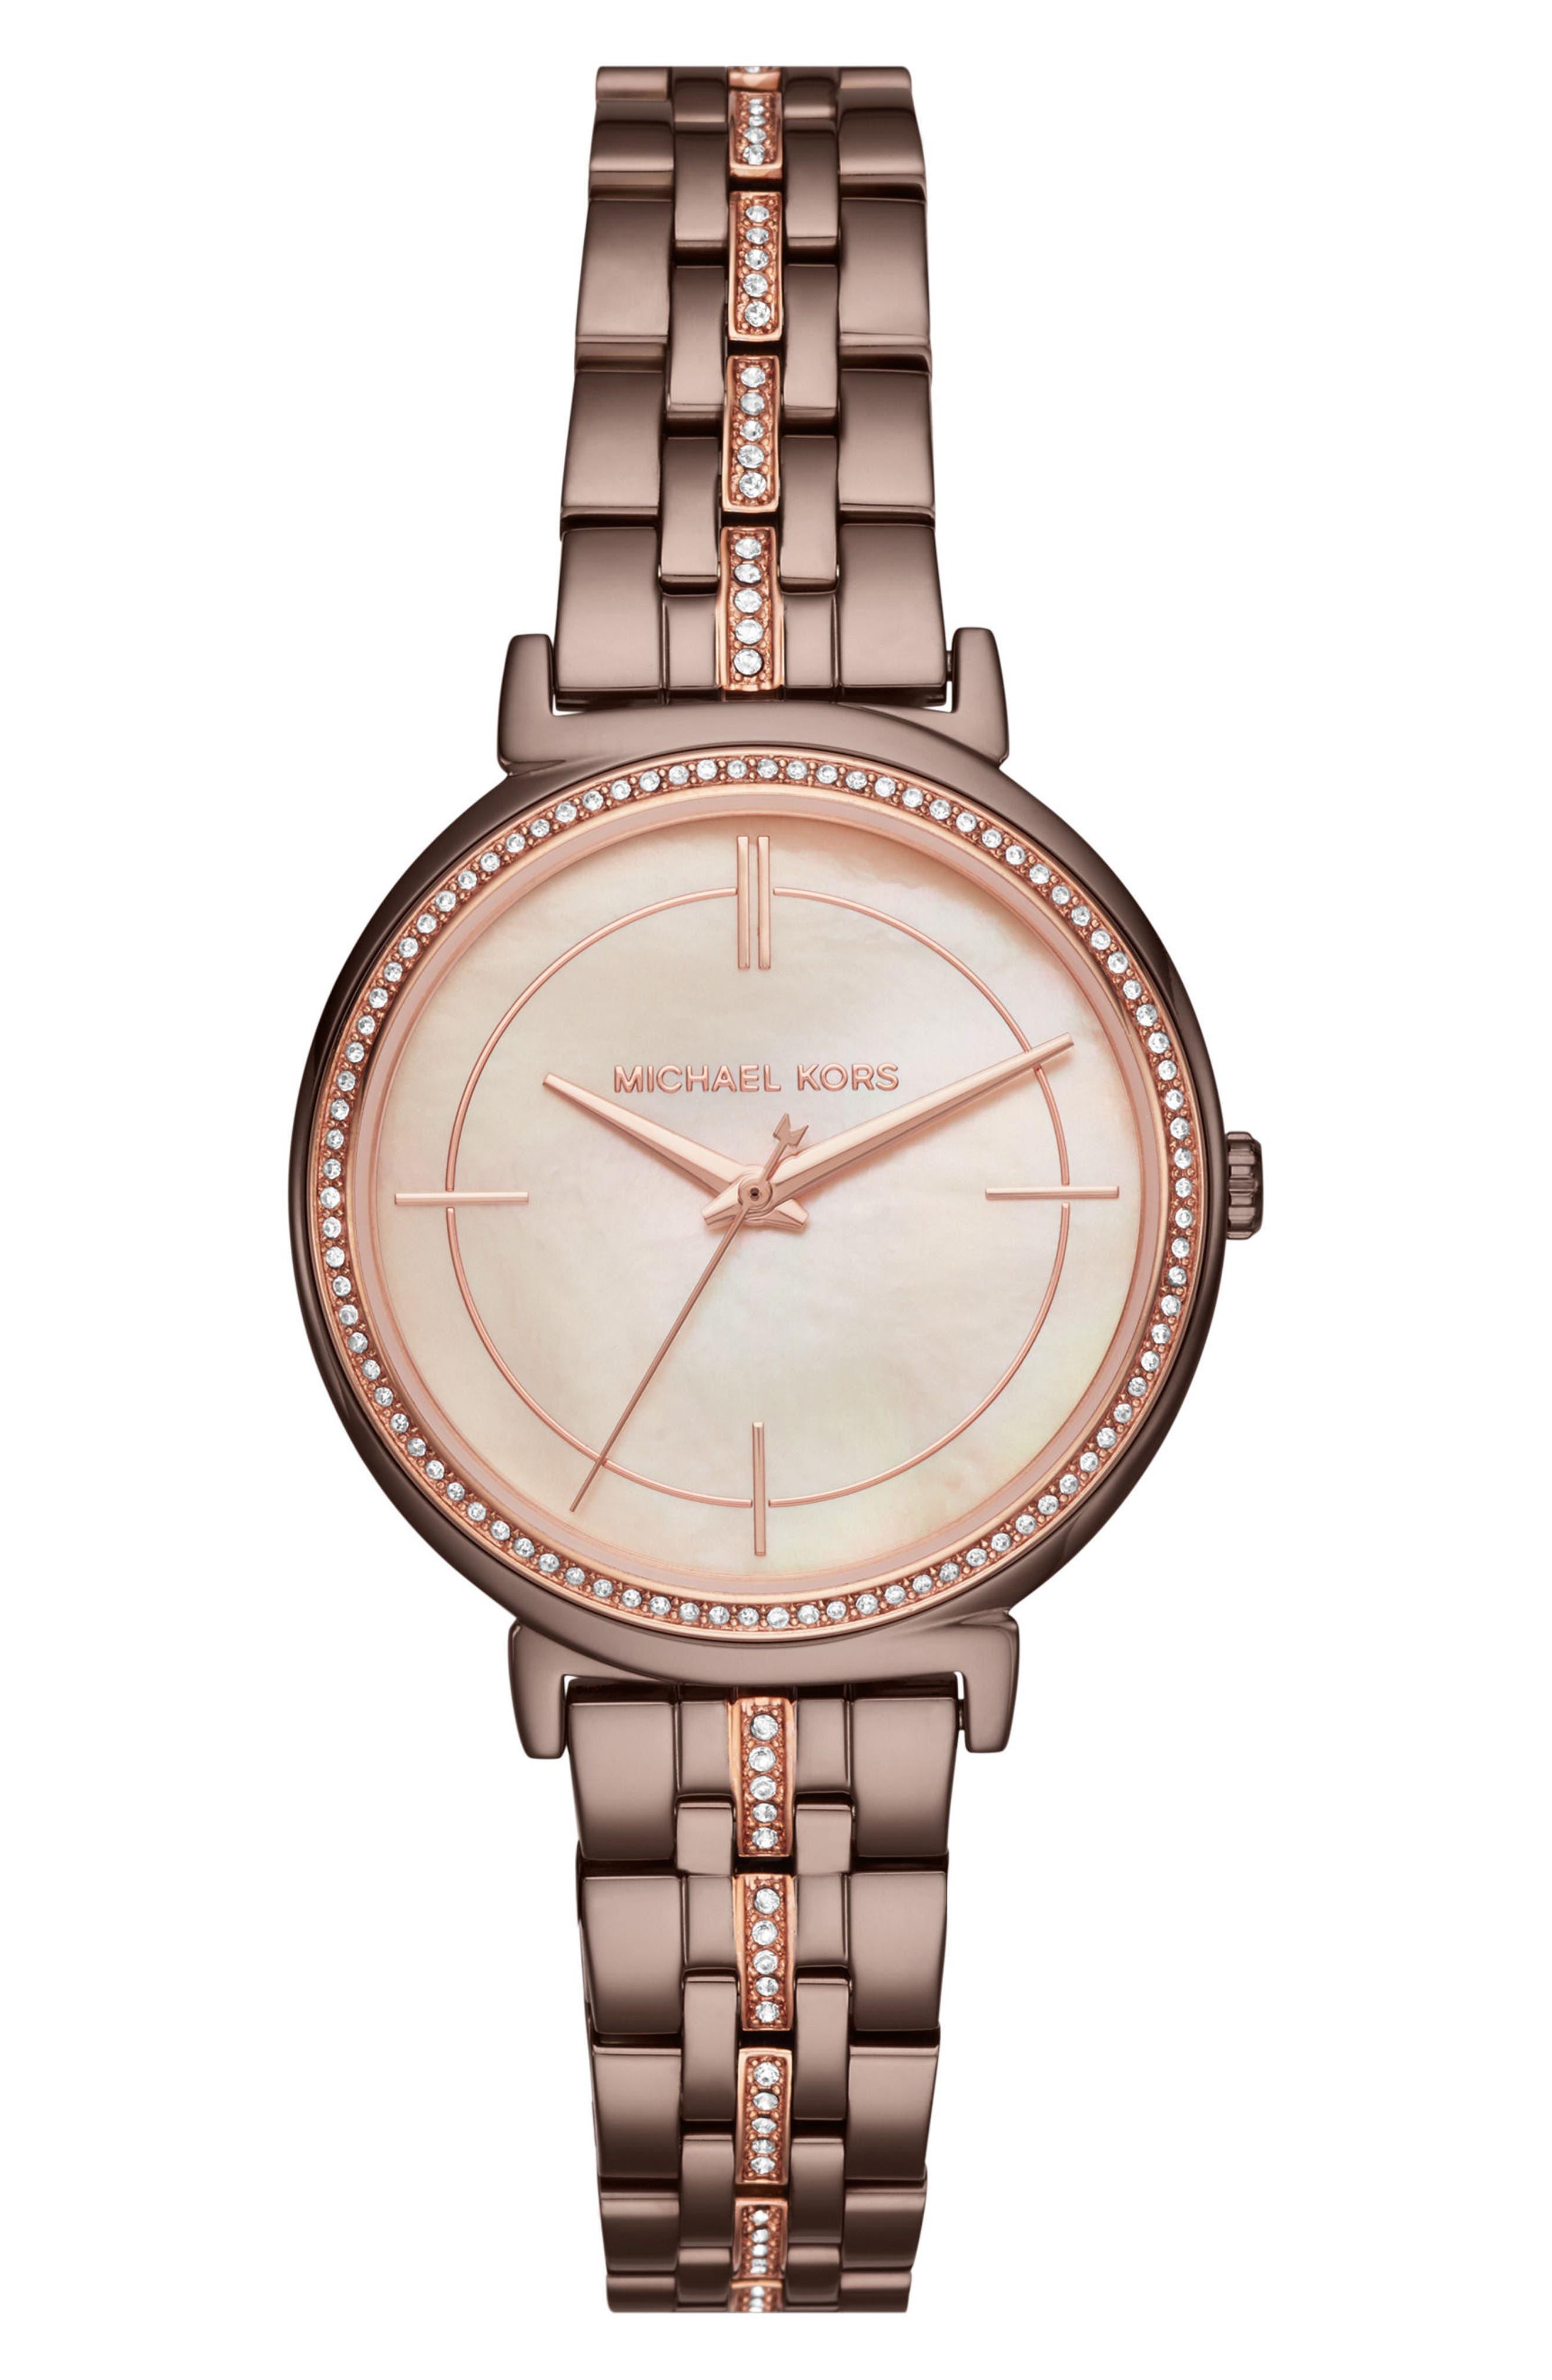 Main Image - Michael Kors Cinthia Crystal Bracelet Watch, 33mm